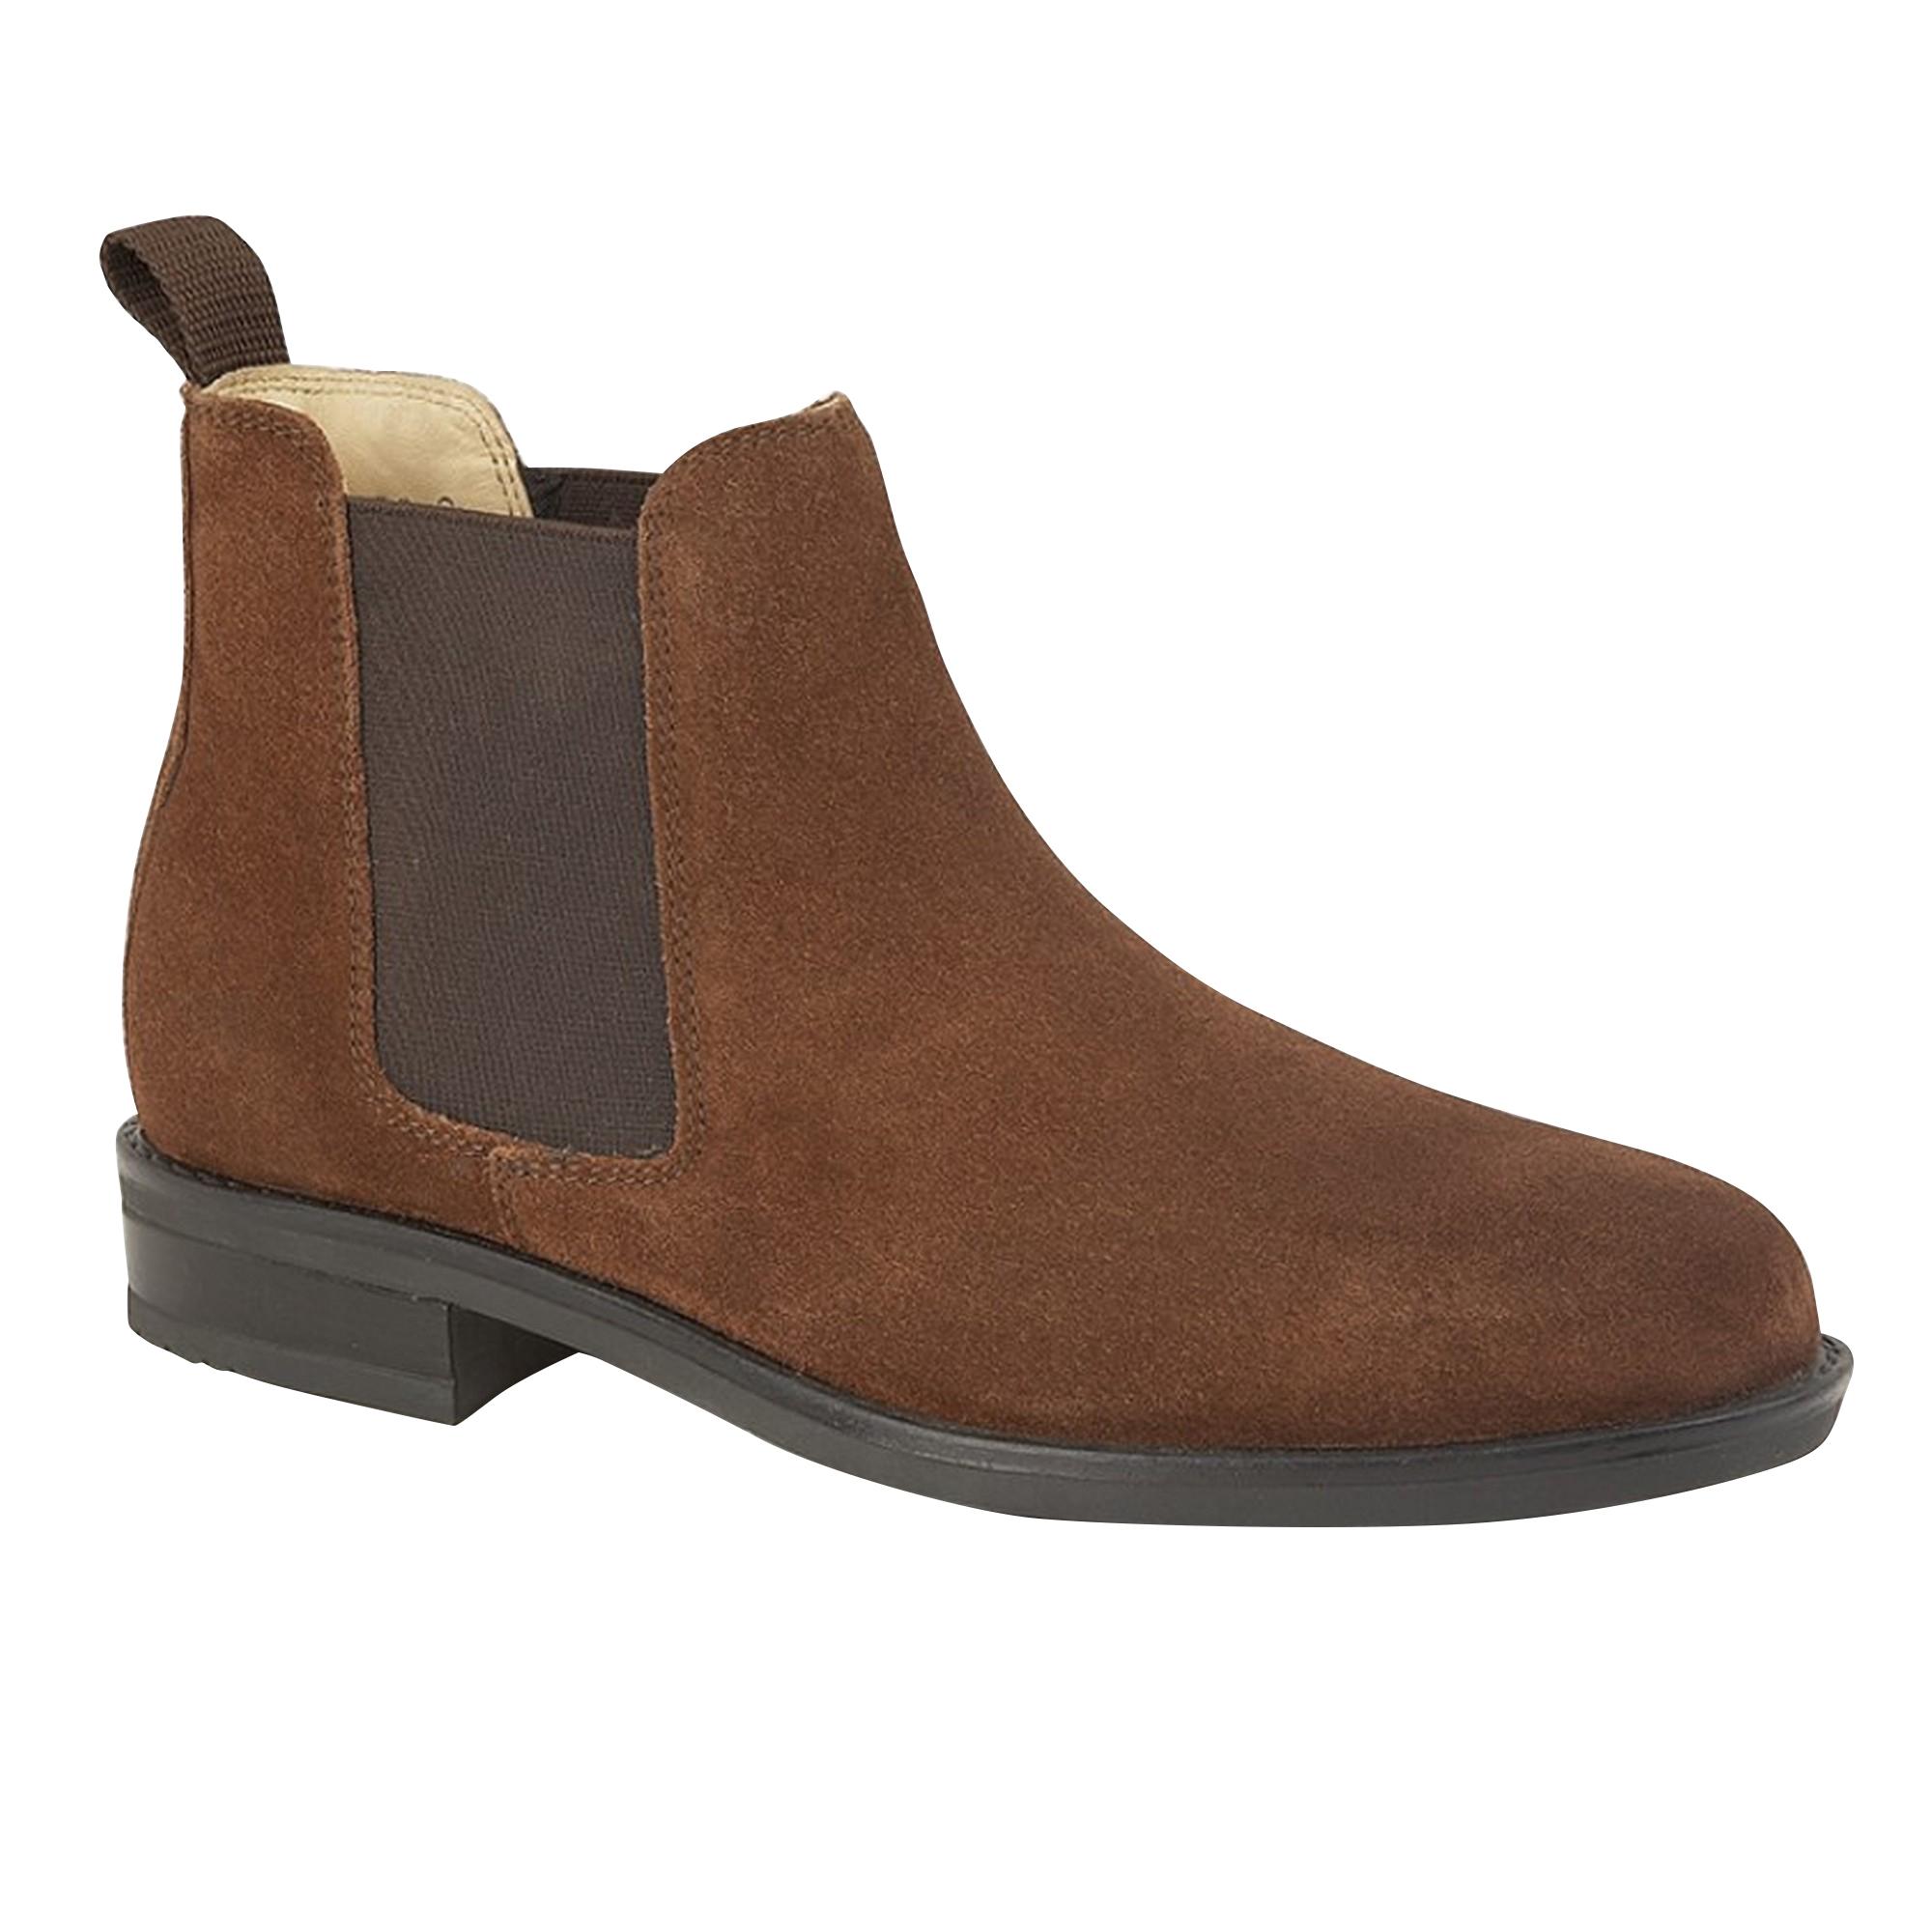 Roamers Mens Gusset Boots (9 UK) (Tan Suede)